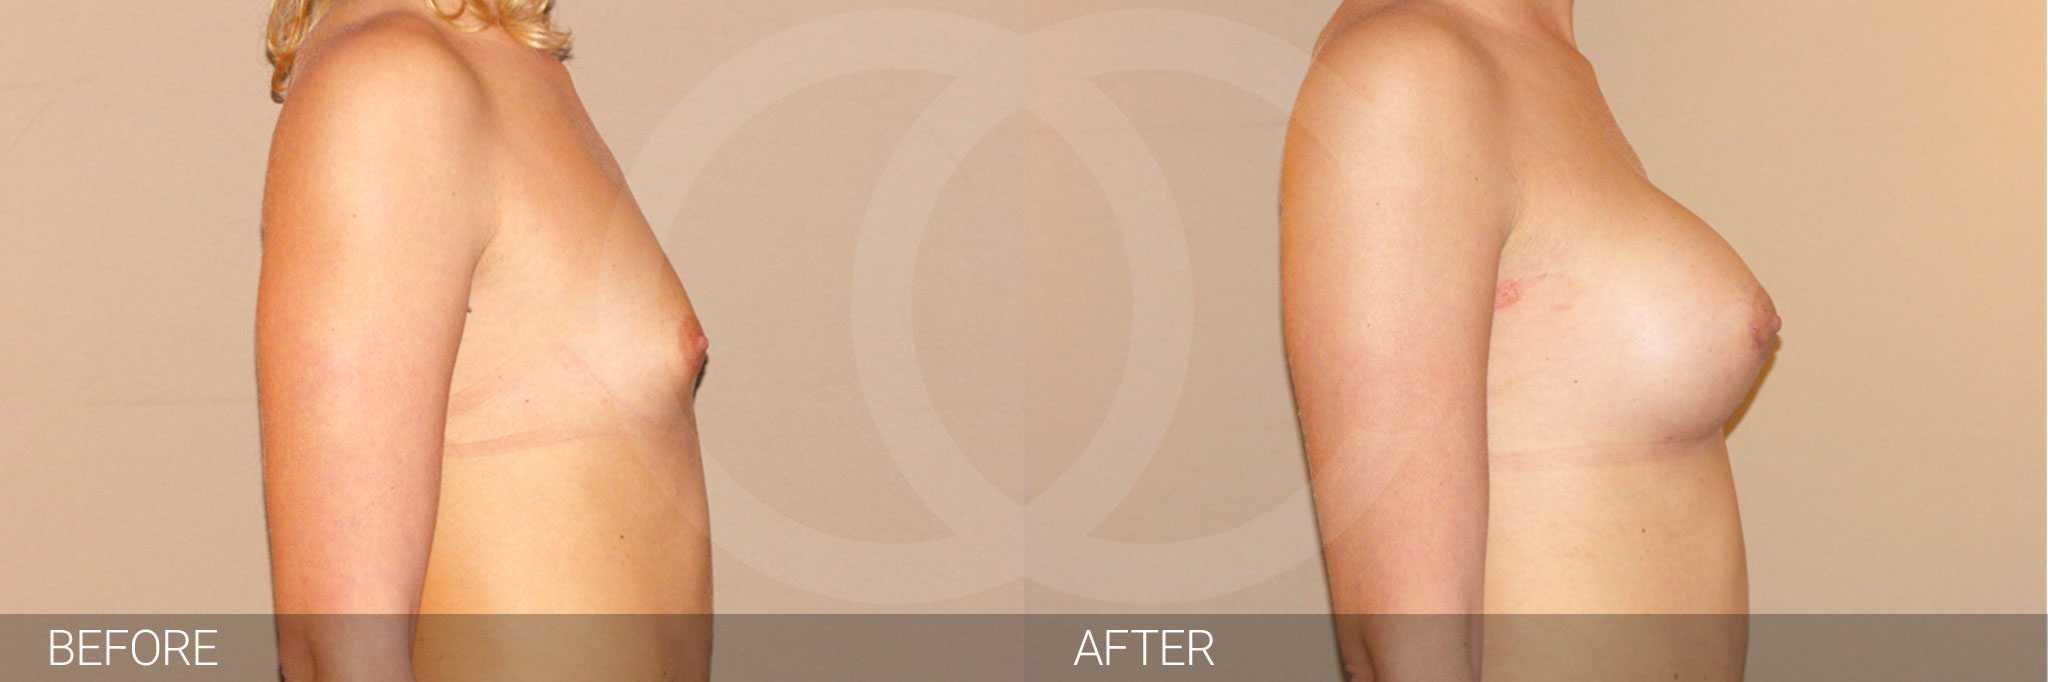 Augmentation mammaire Prothèse en silicone ante/post-op III